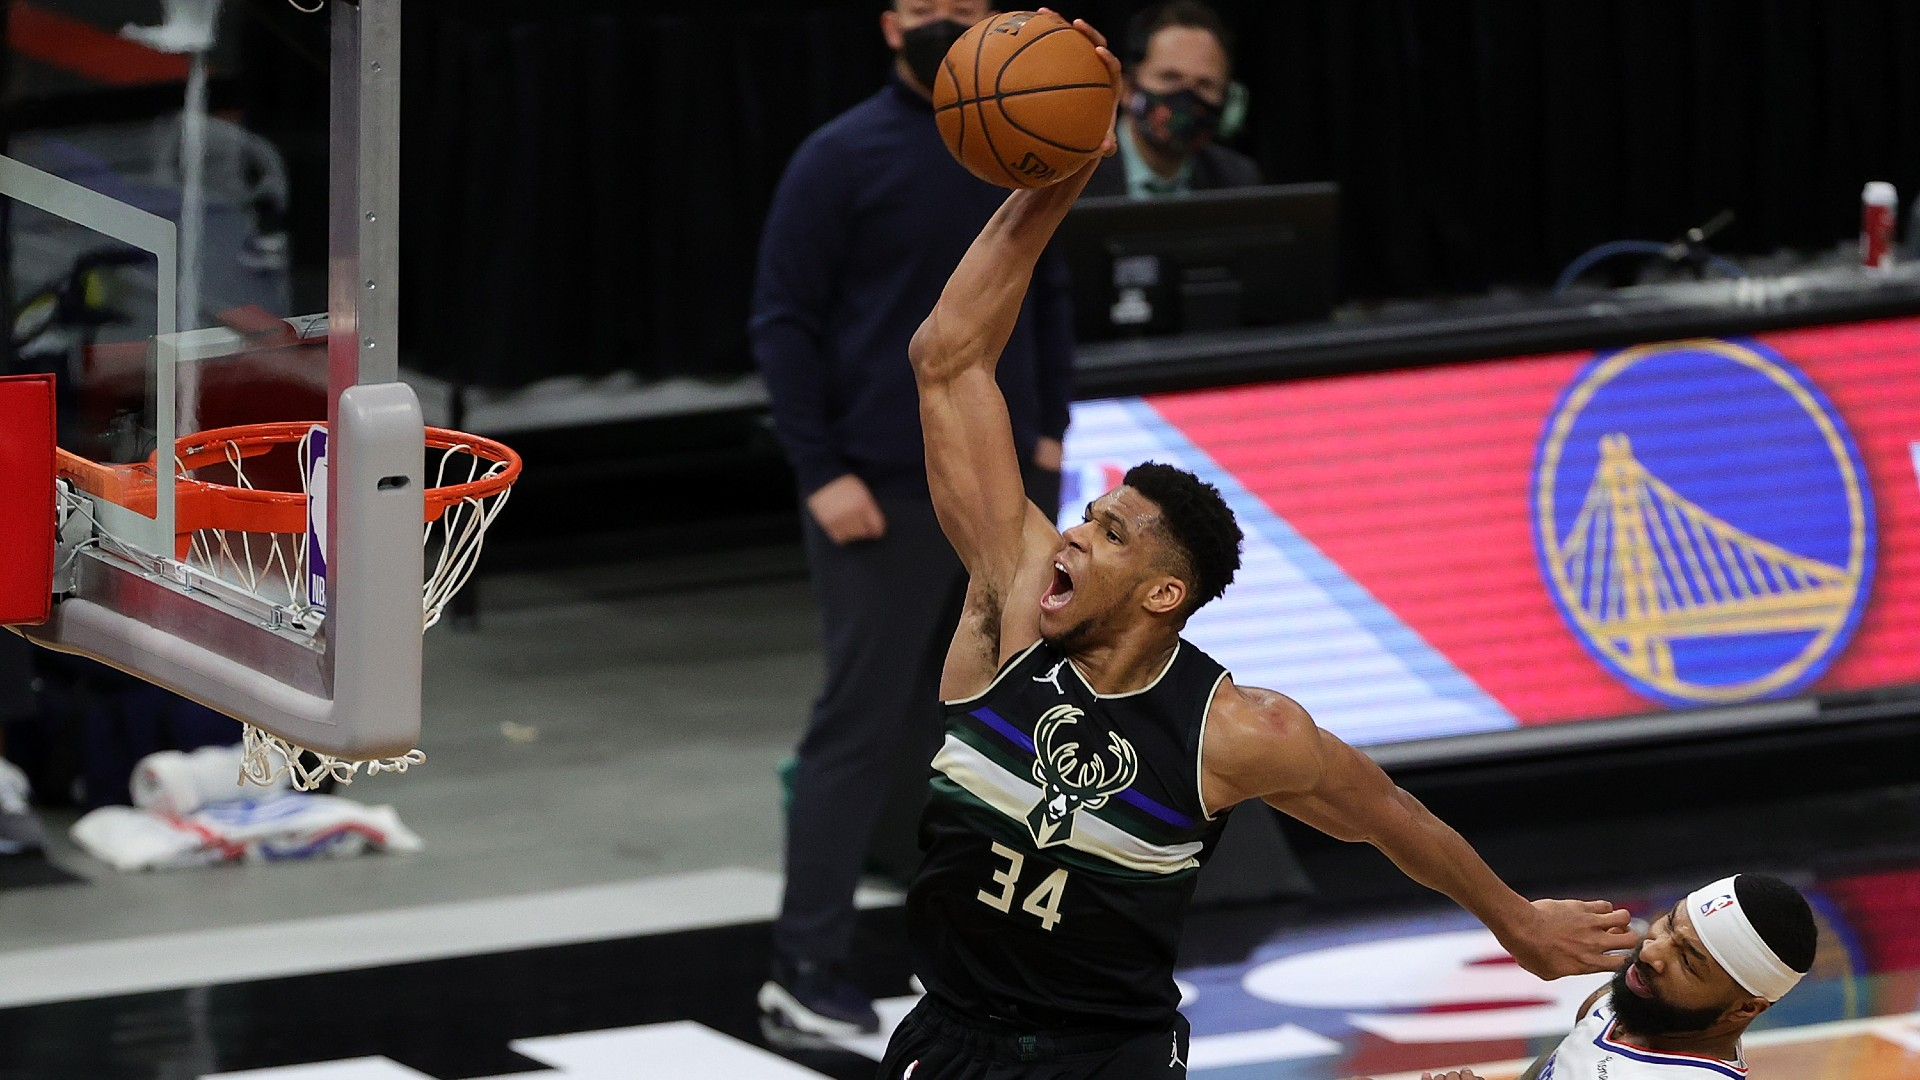 NBA Heat Check: The Greek Freak on fire as Steph suffers three-point slump